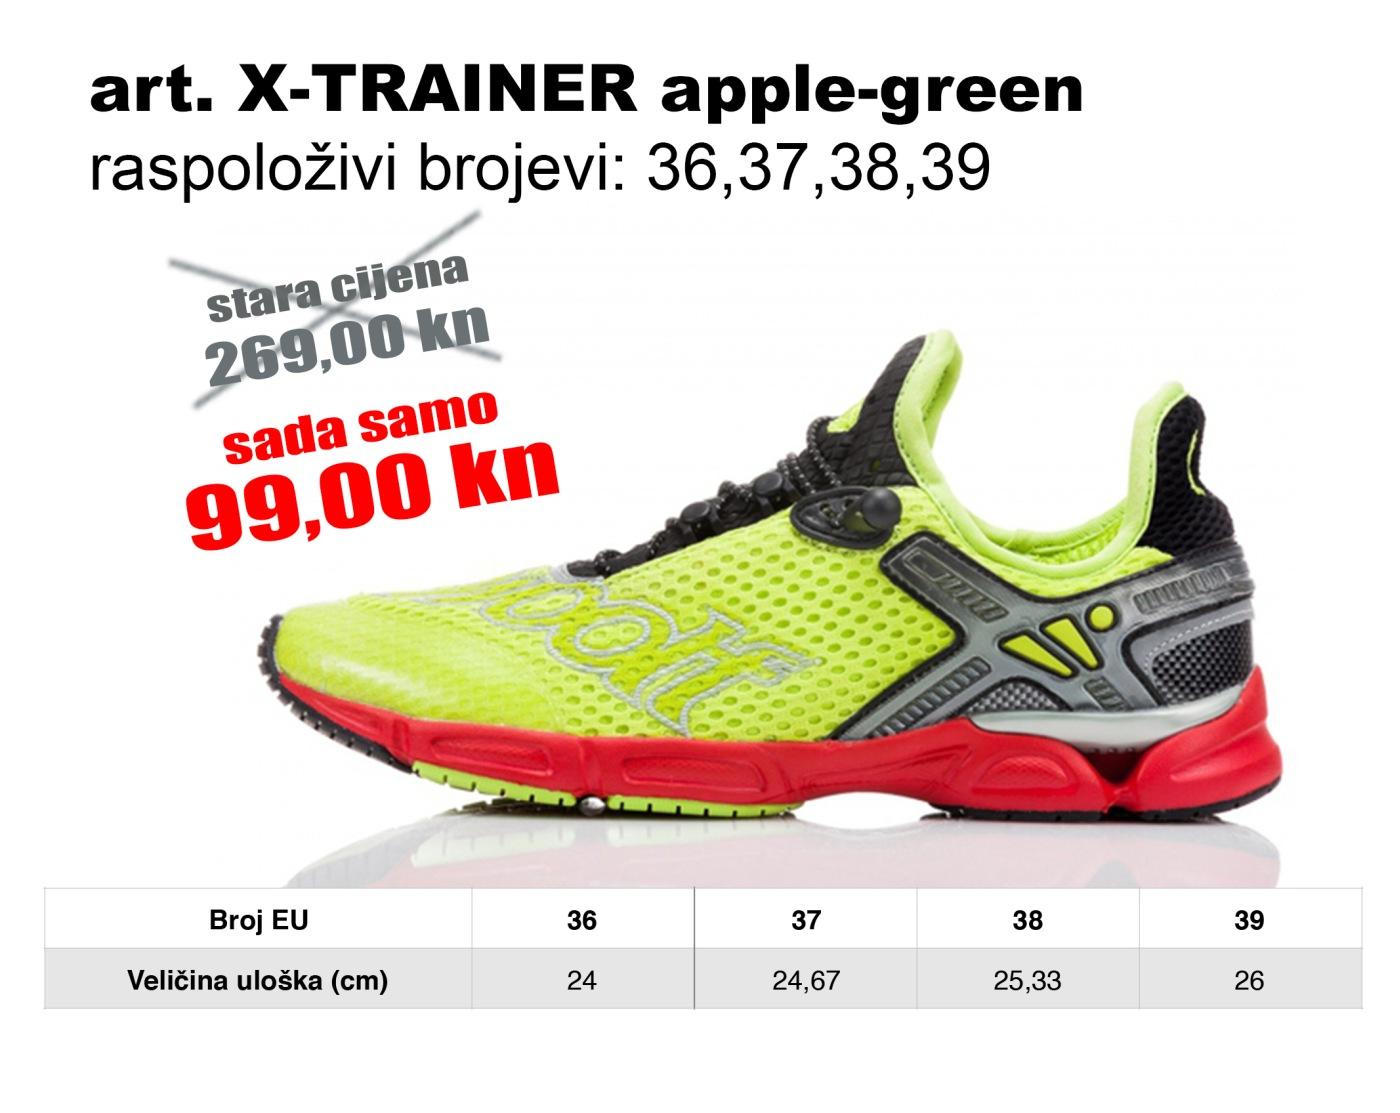 X-TRAINER apple